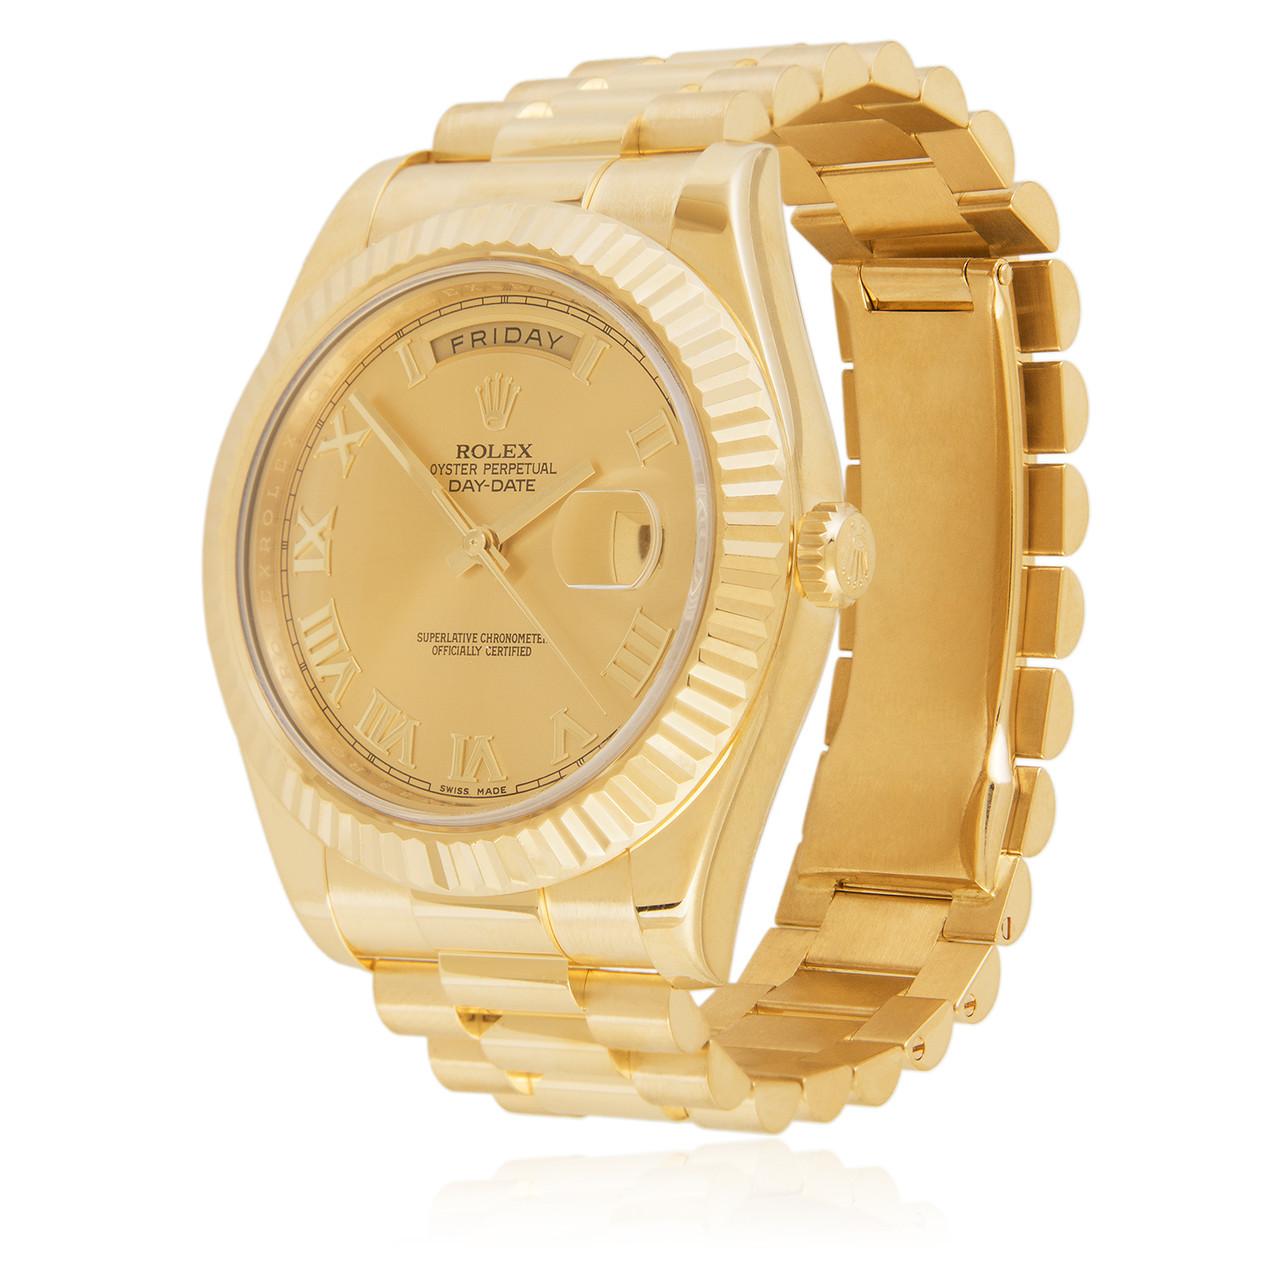 58fc9ba4ec75 Next. Rolex Day-Date II 18K Yellow Gold President Gold Dial Automatic Men s  Watch